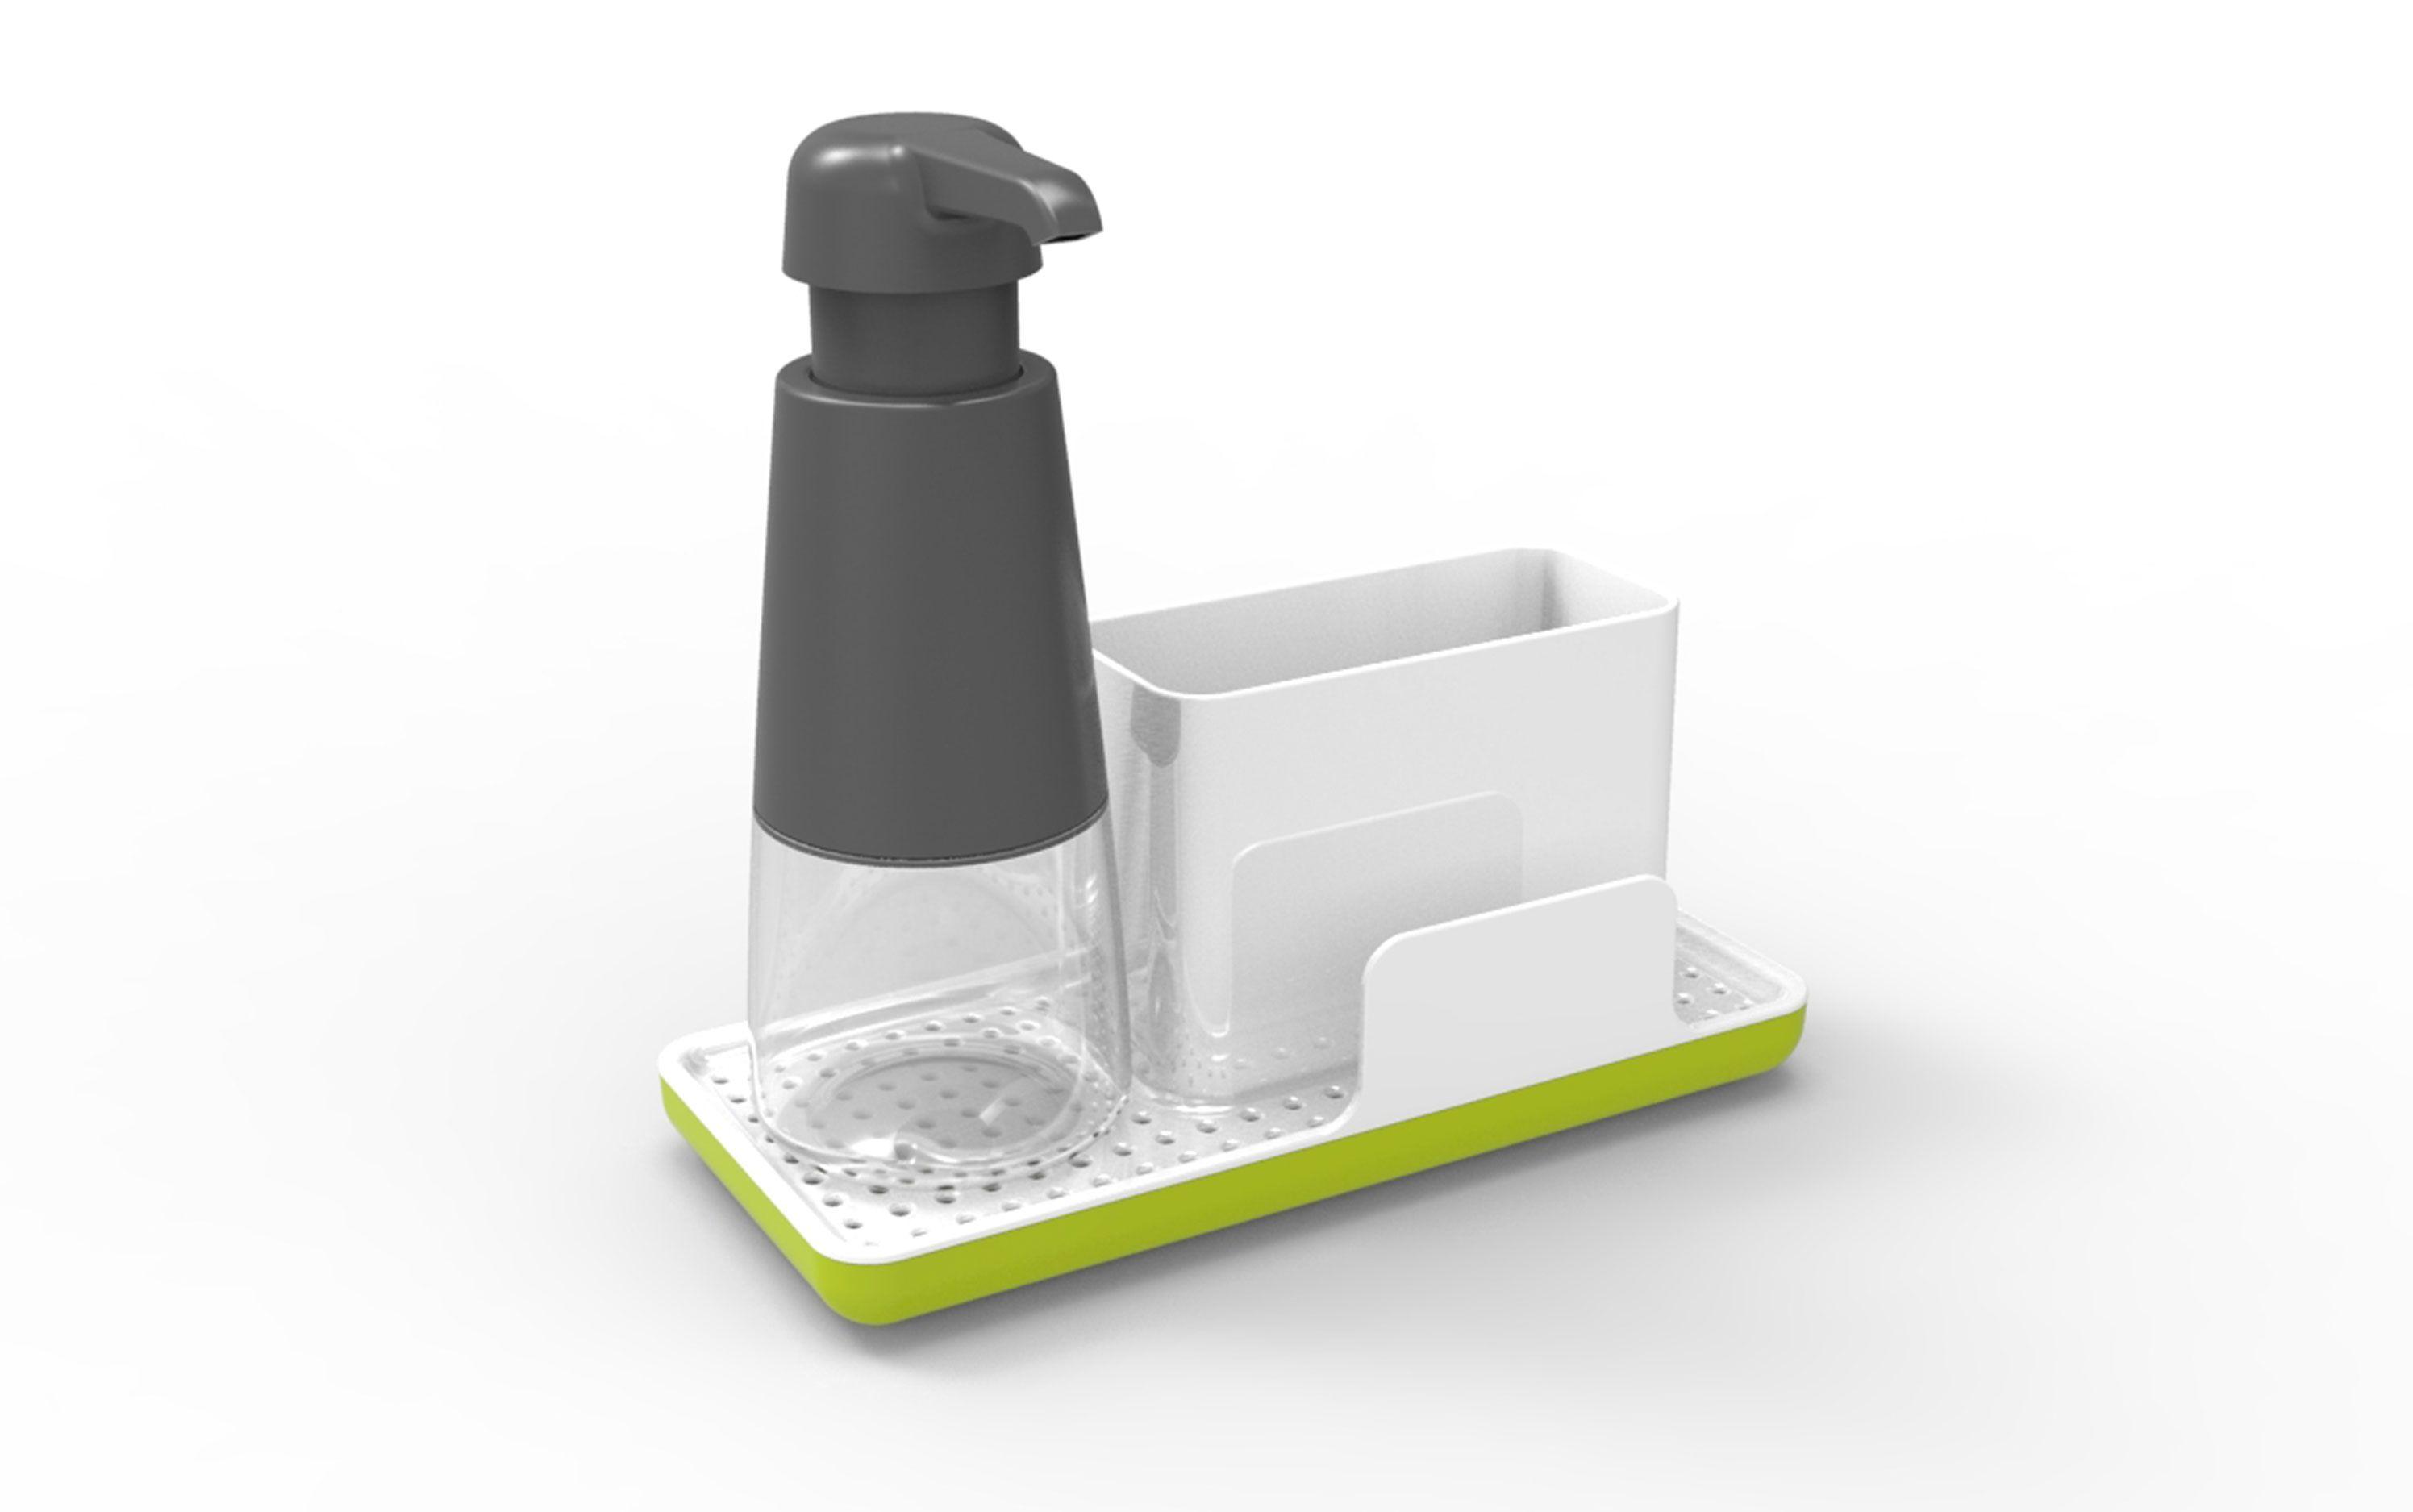 Stylish Design Provides Organized Storage for A Variety of Dish ...